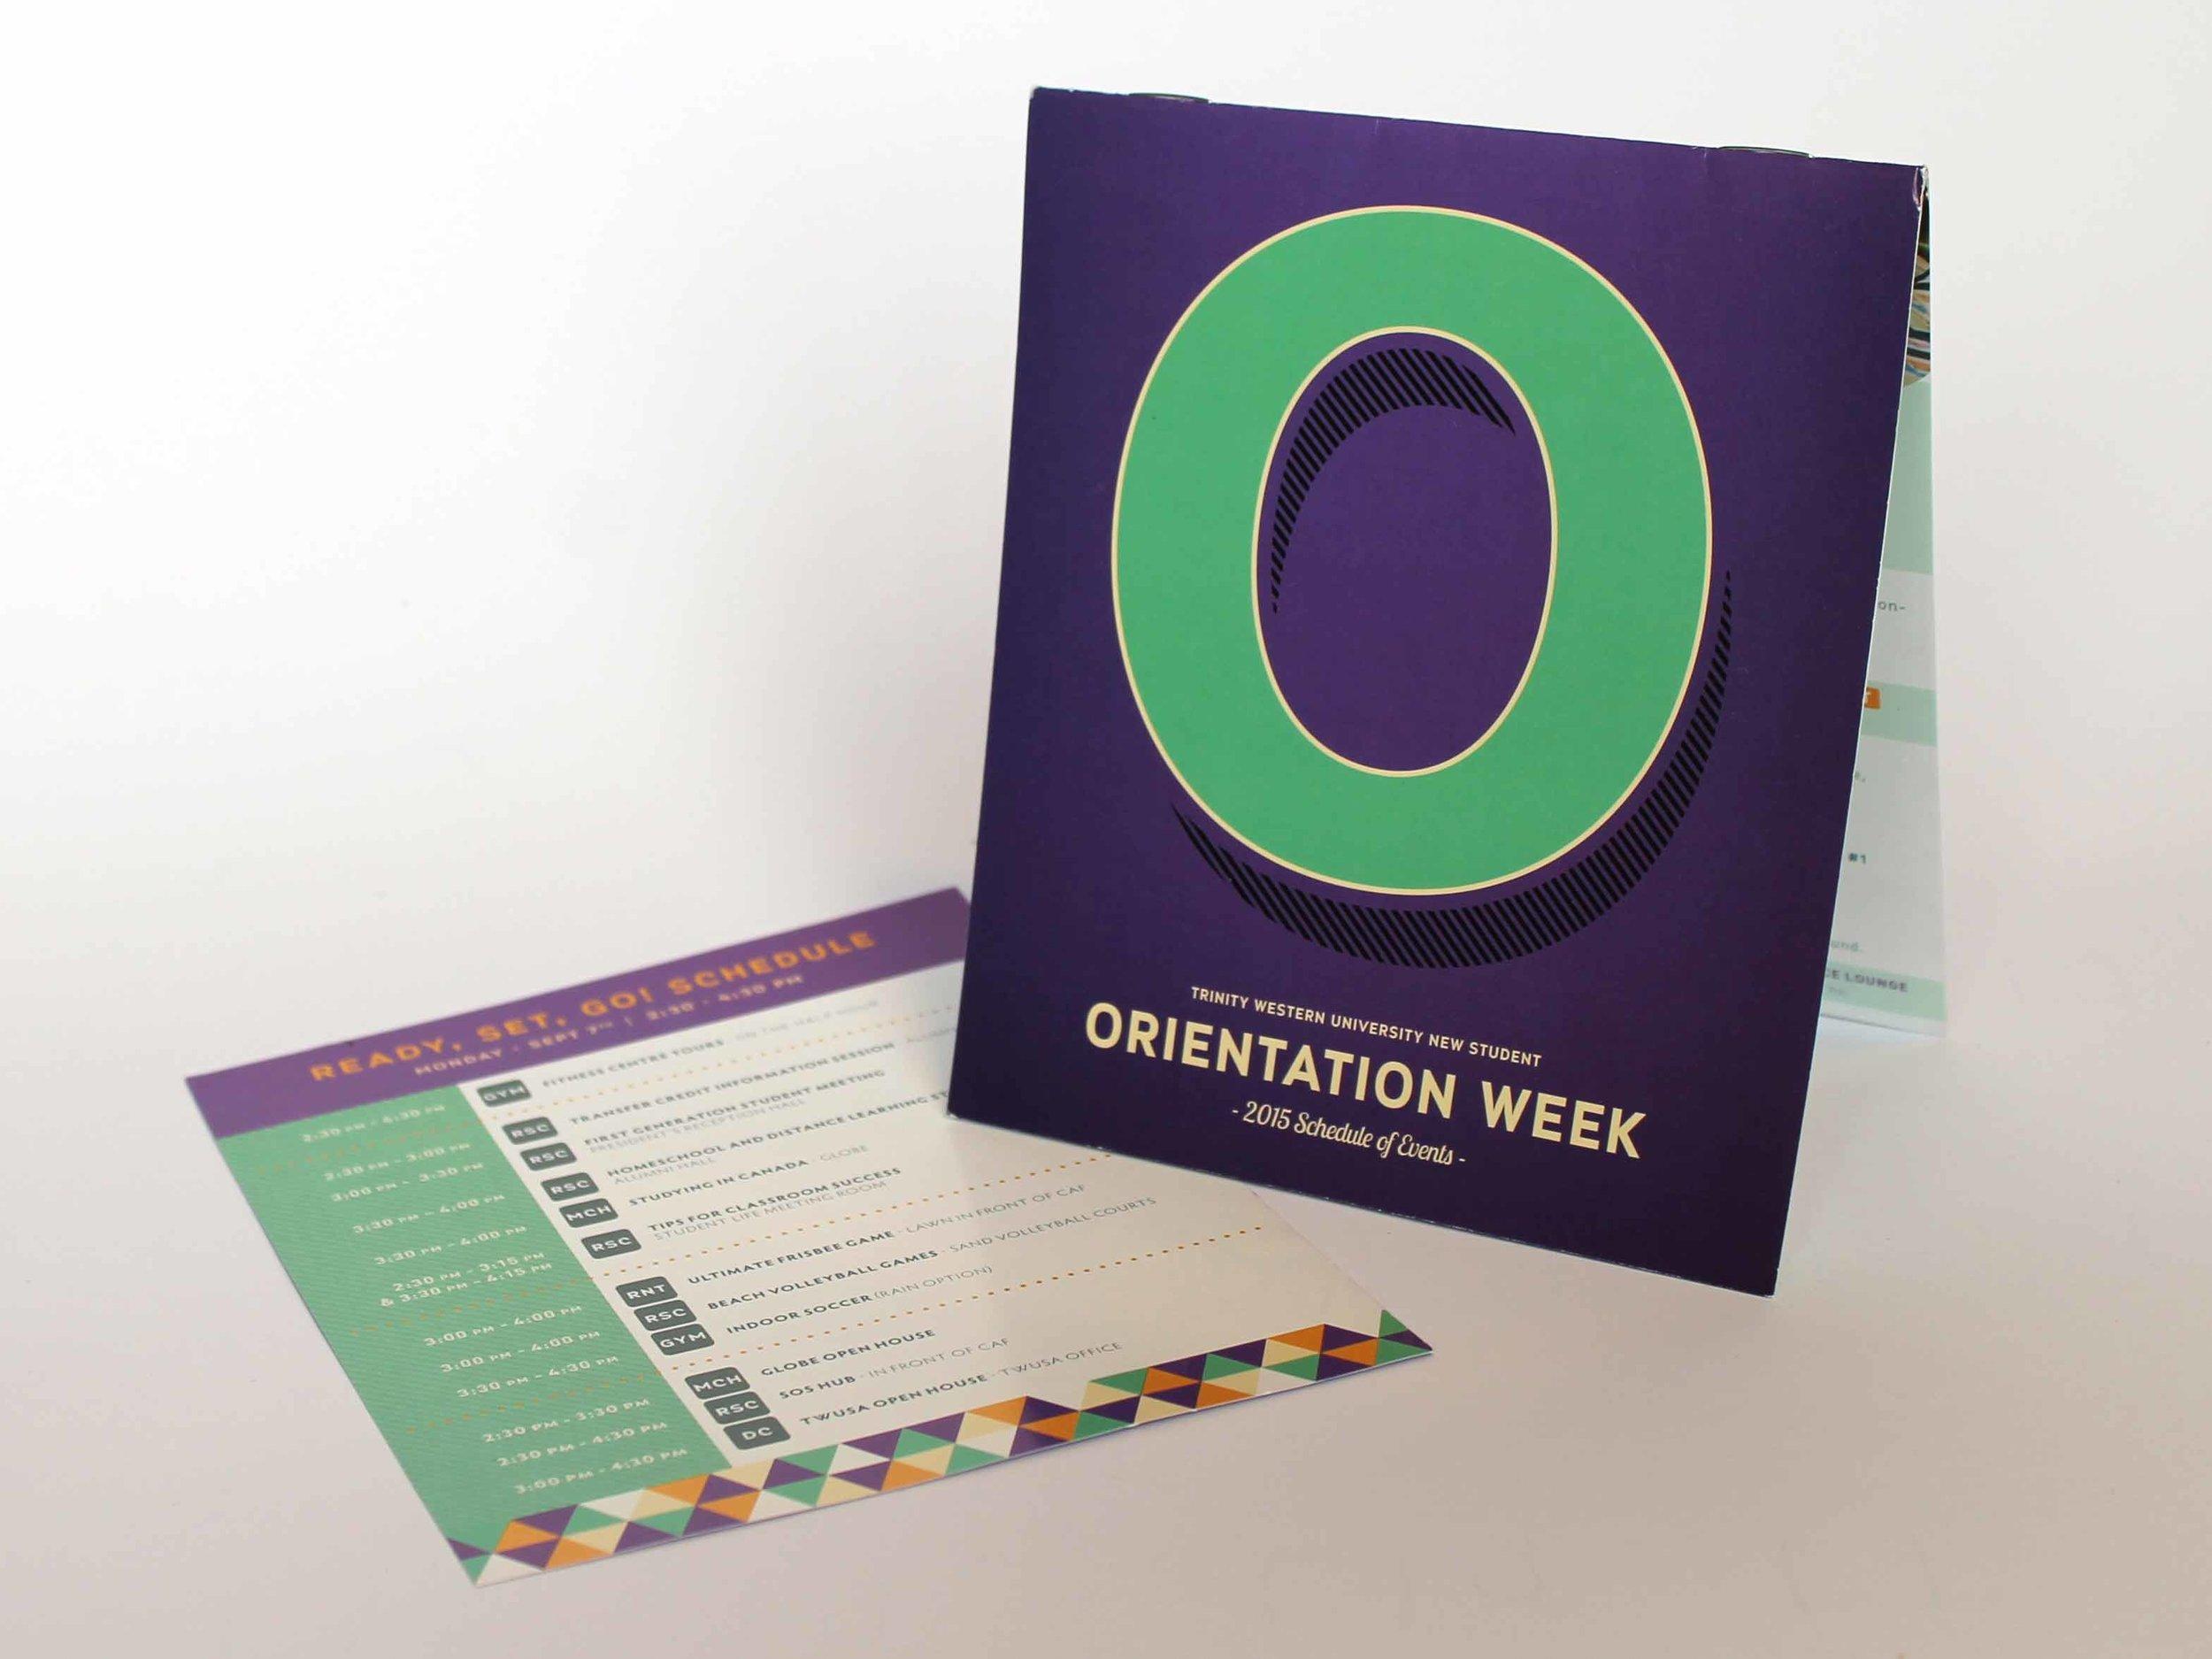 Trinity Western University  Orientation Week Schedule